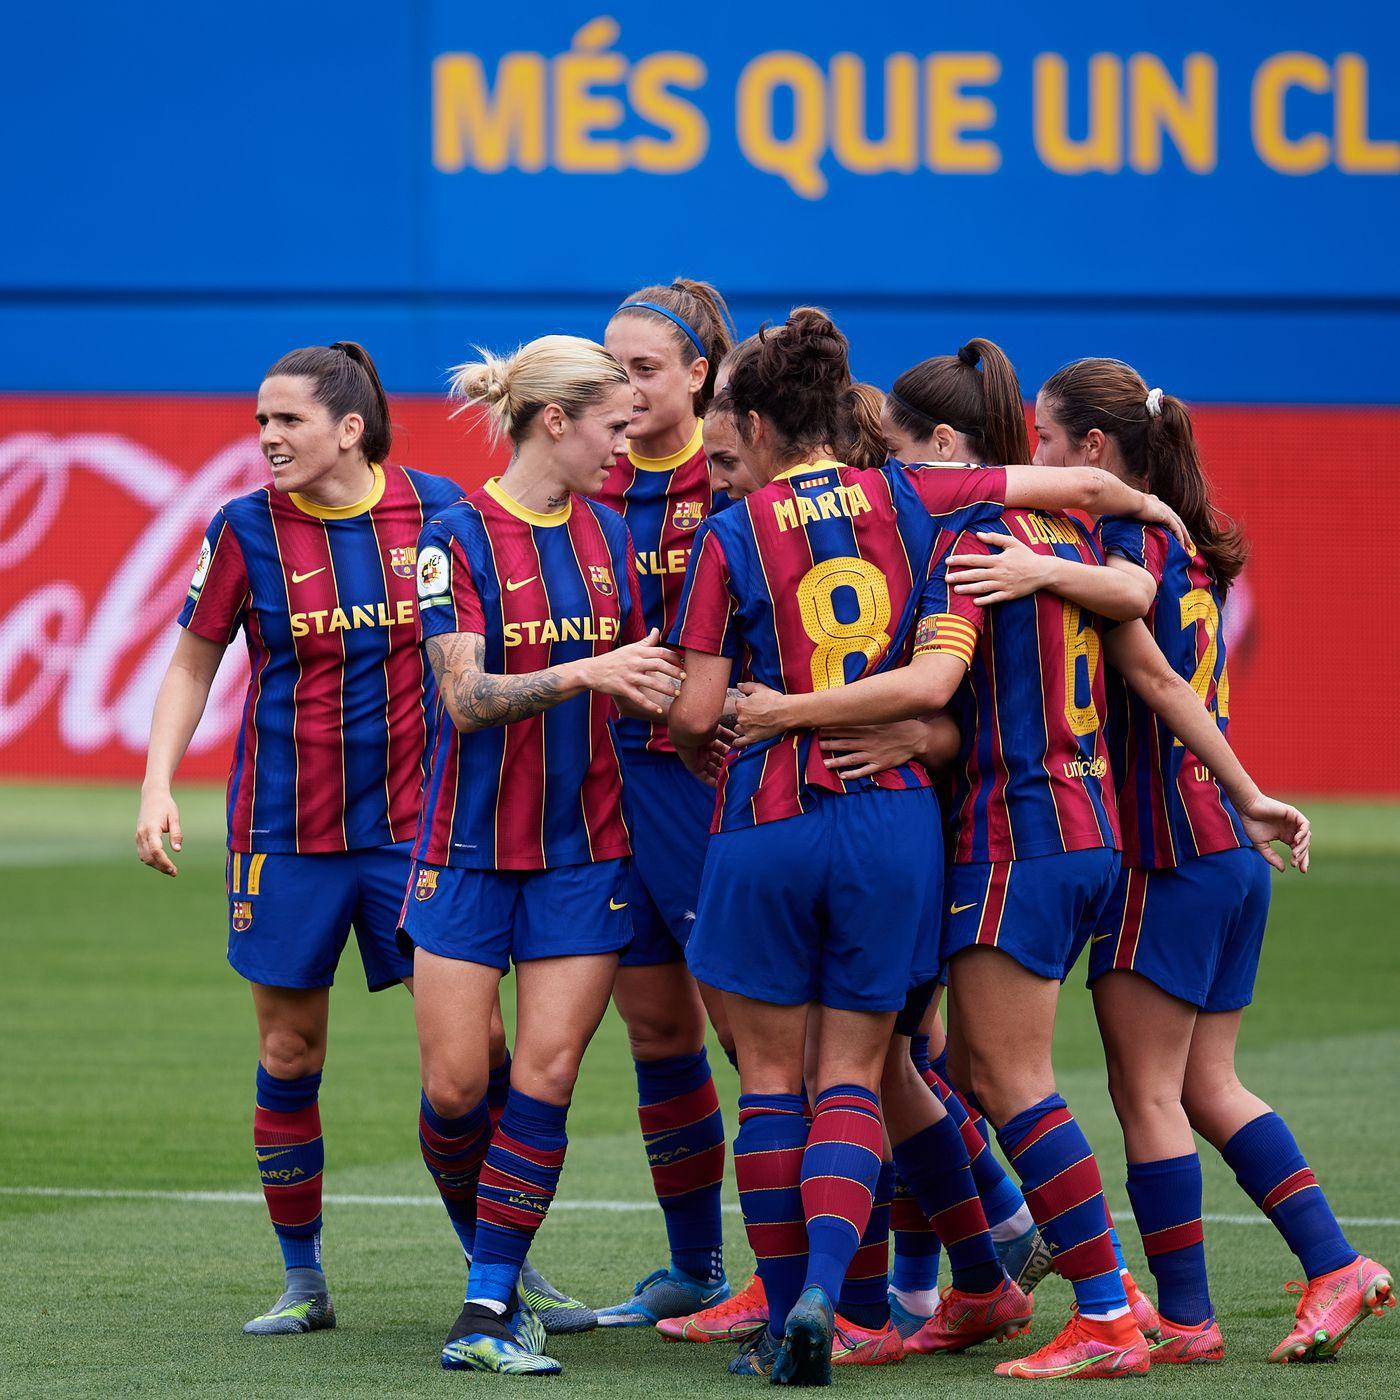 FC Barcelona News: 5 April 2021; All set for Valladolid, Barça Women extend  perfect run - Barca Blaugranes